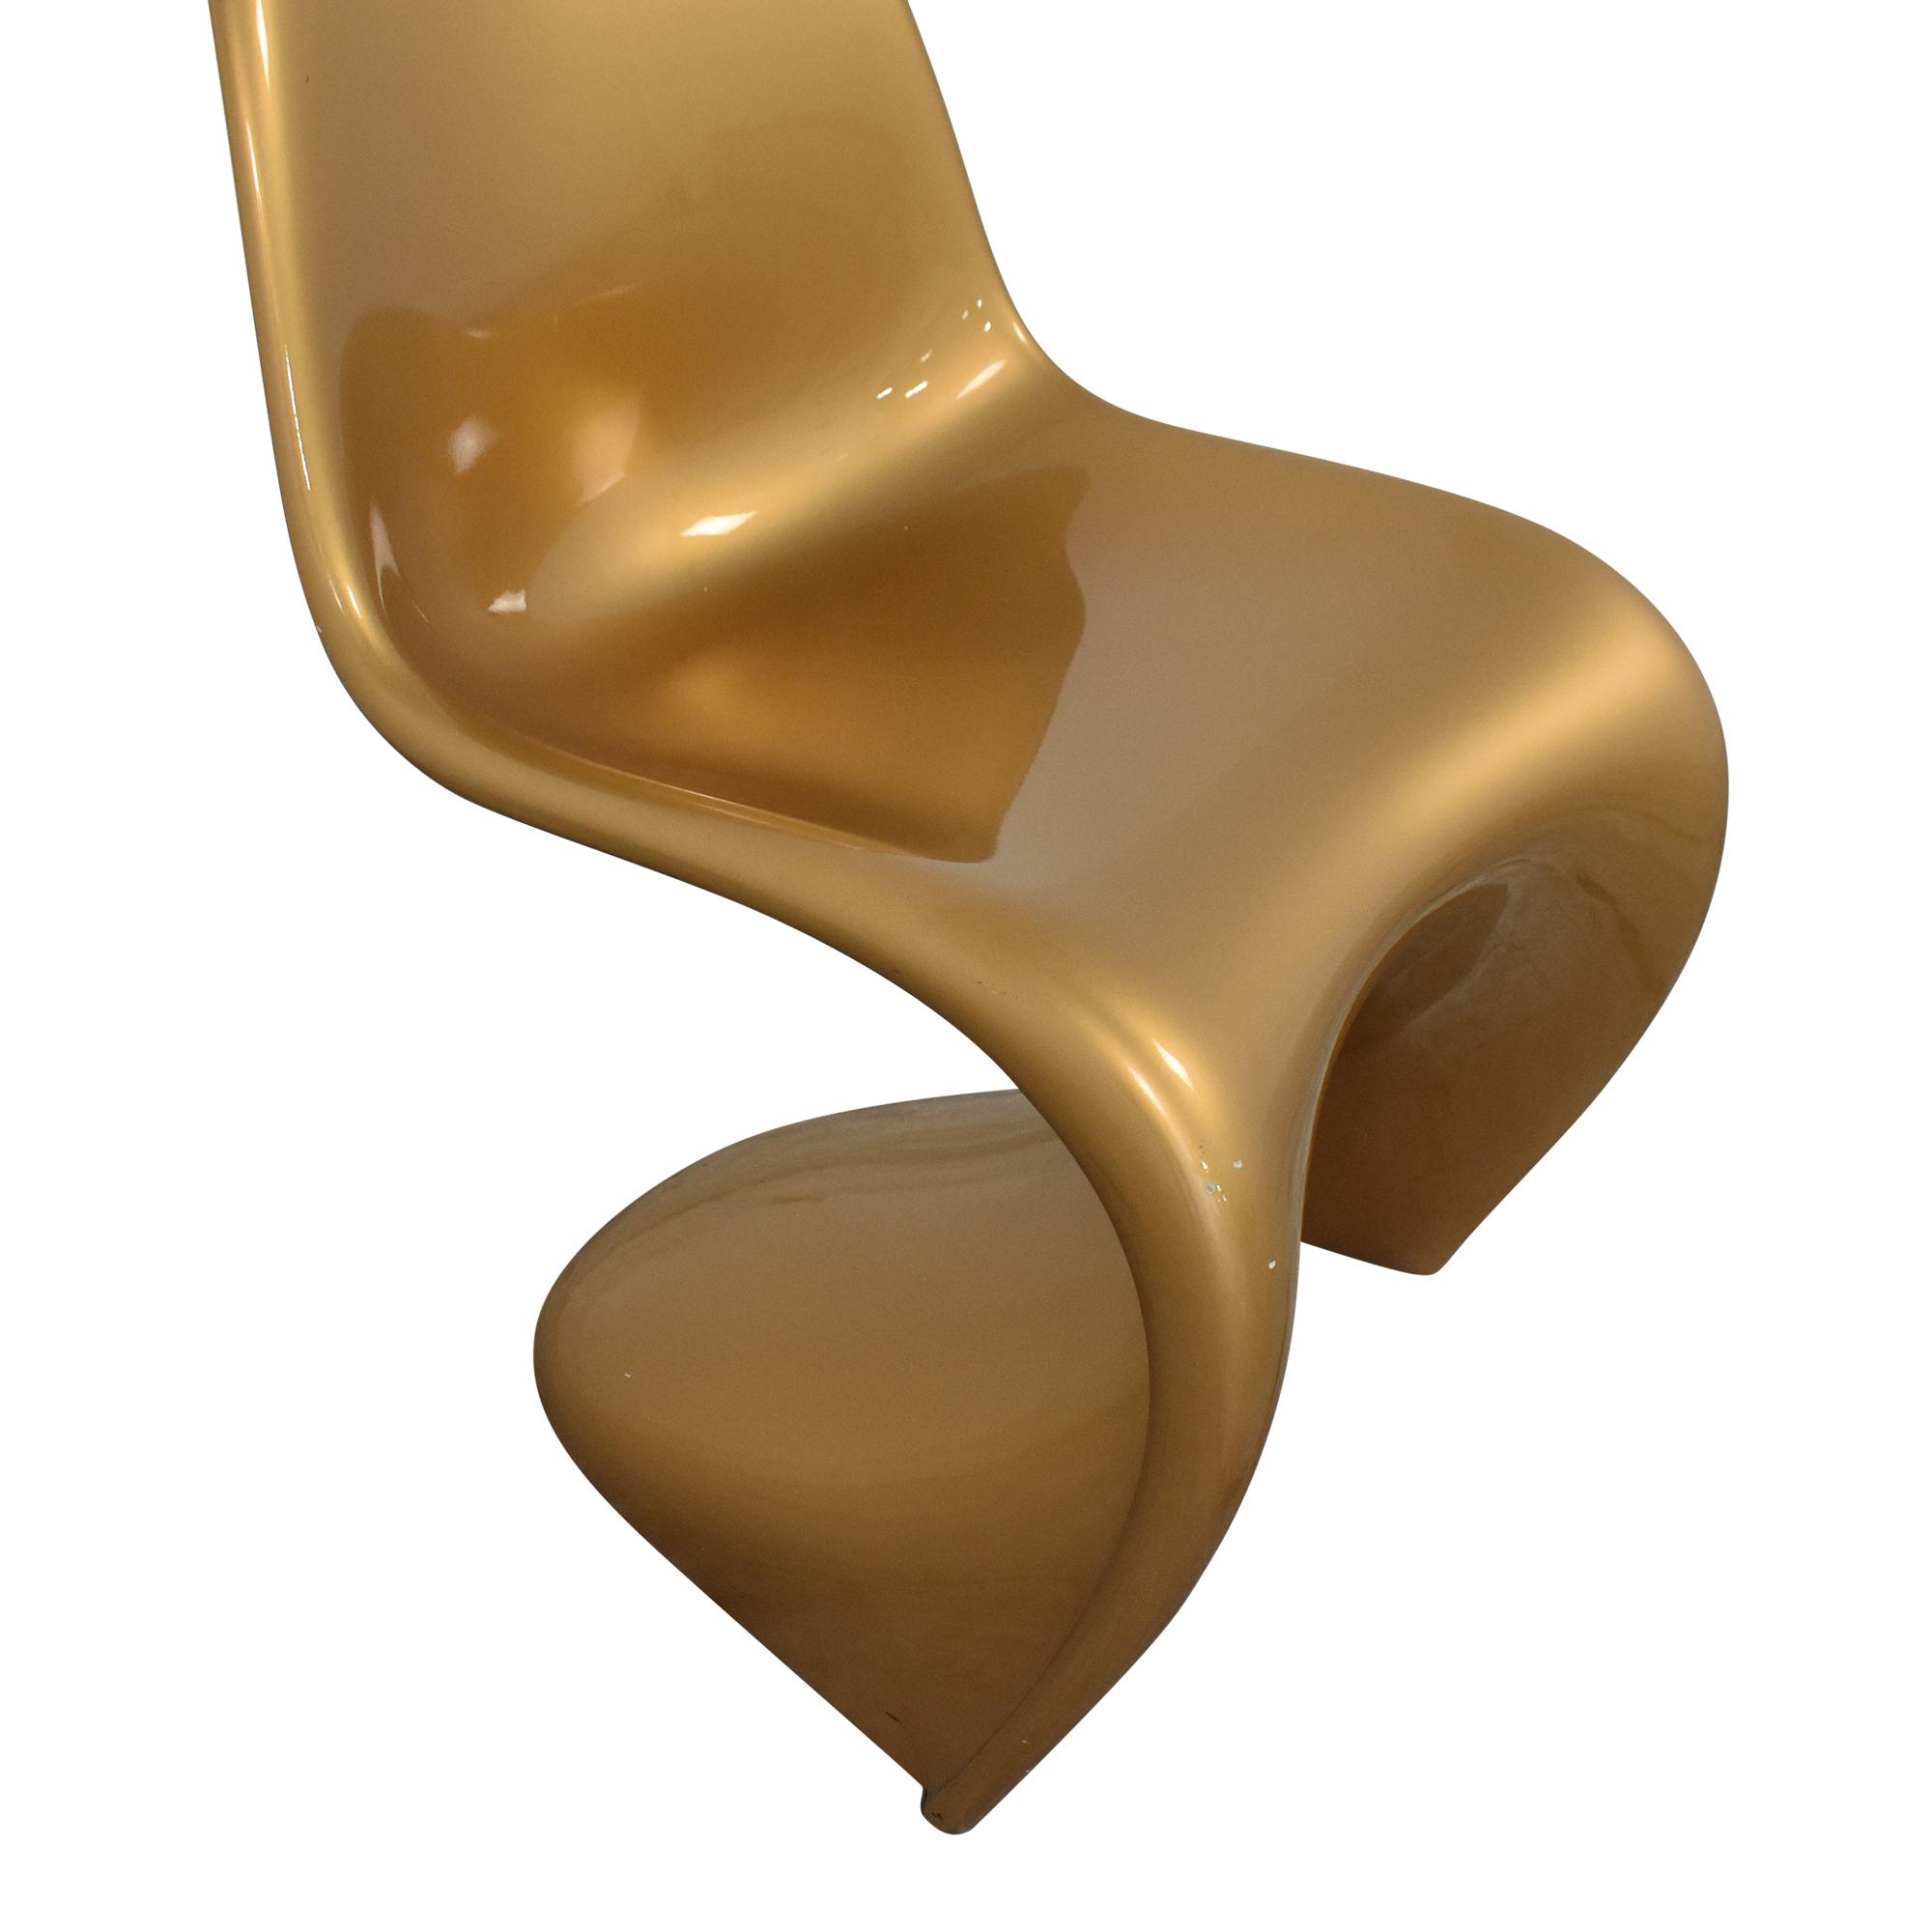 buy Vitra Verner Panton Chair Vitra Chairs